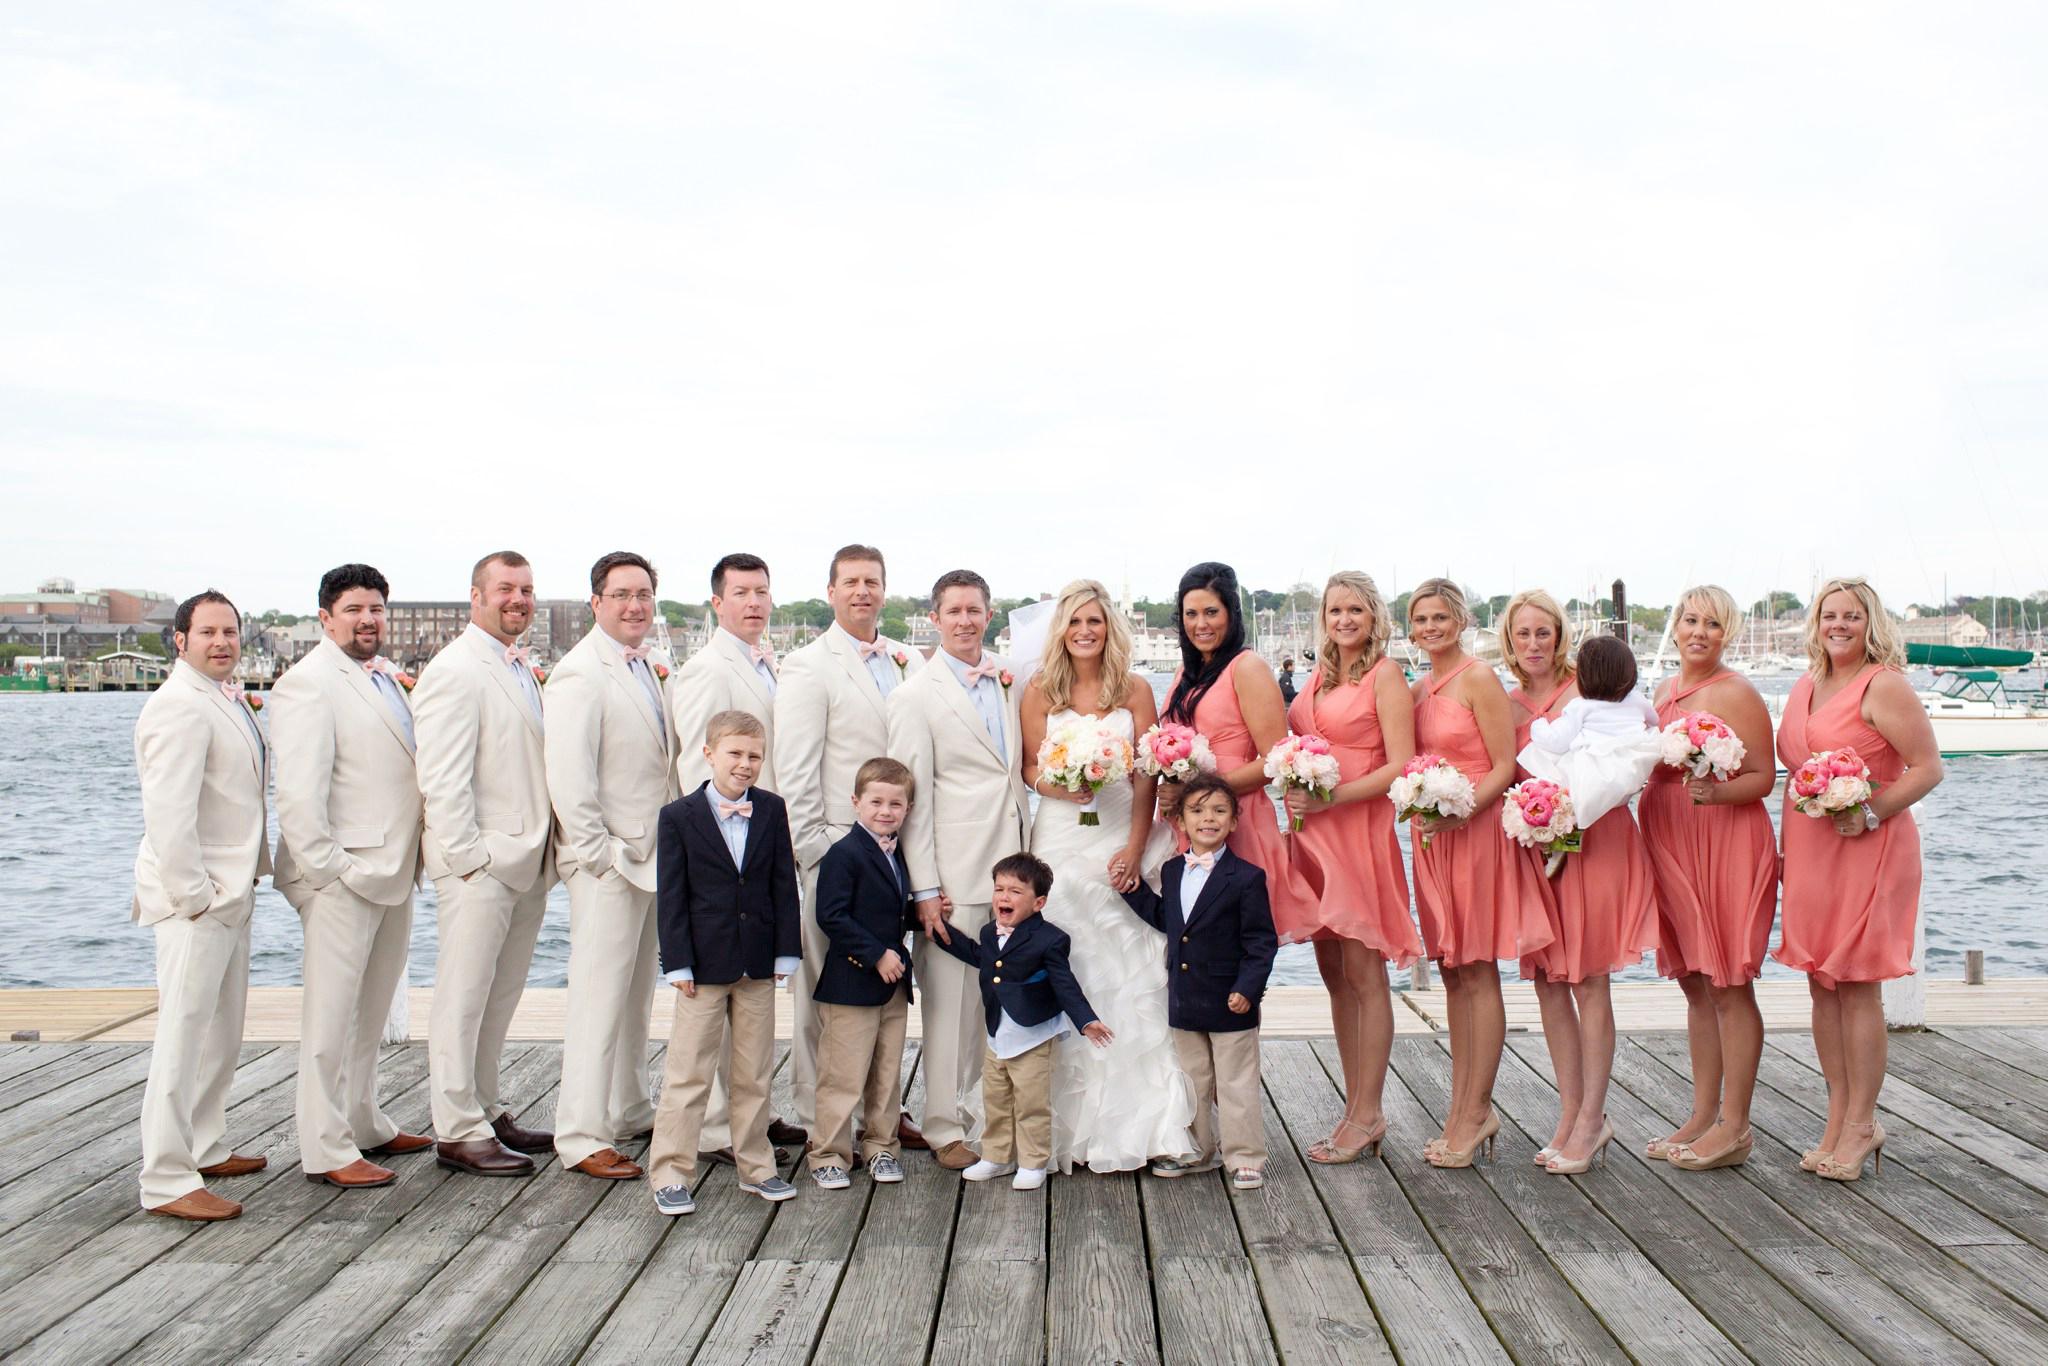 newport_harbor_wedding_00025.JPG